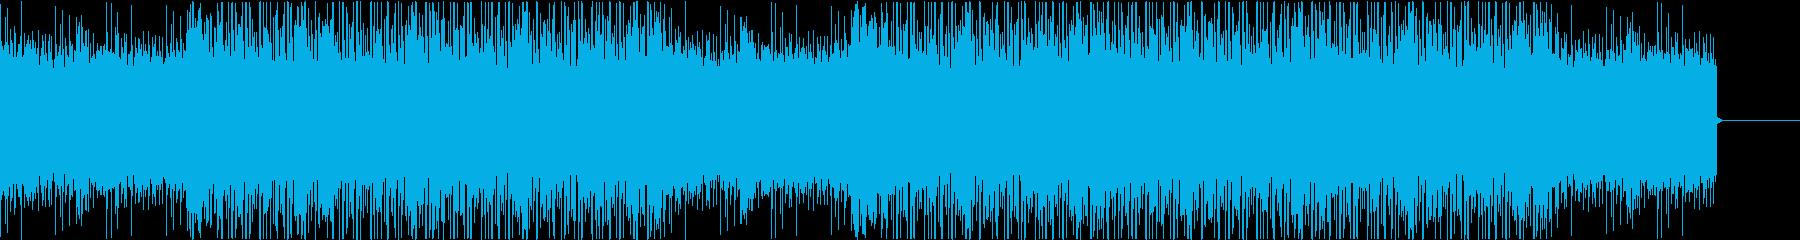 Lofi,ローファイヒップホップ5の再生済みの波形